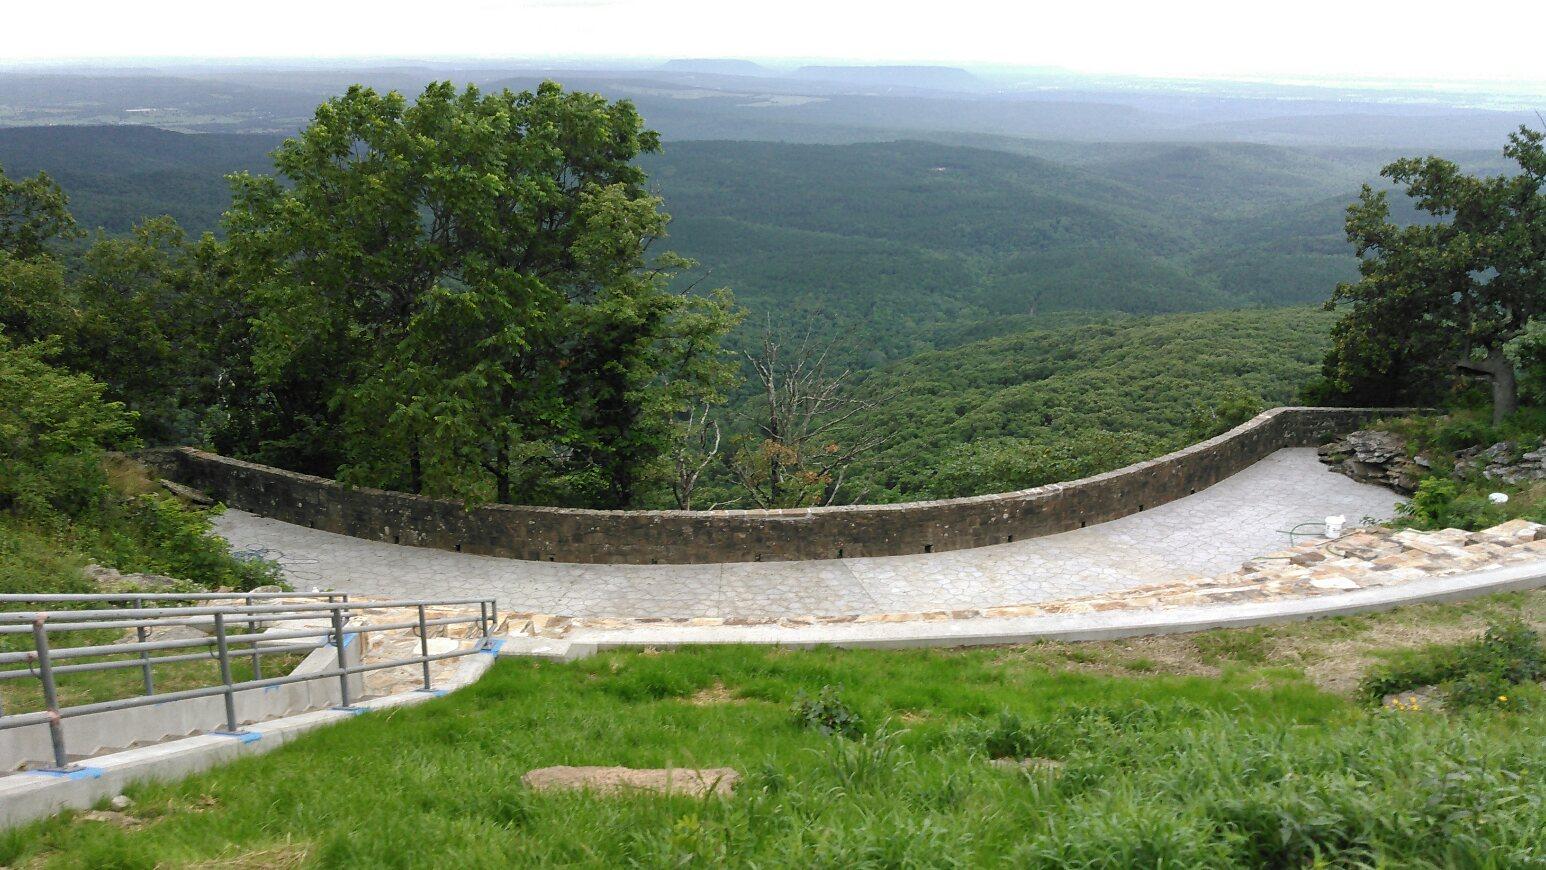 Cameron Bluff Amphitheater